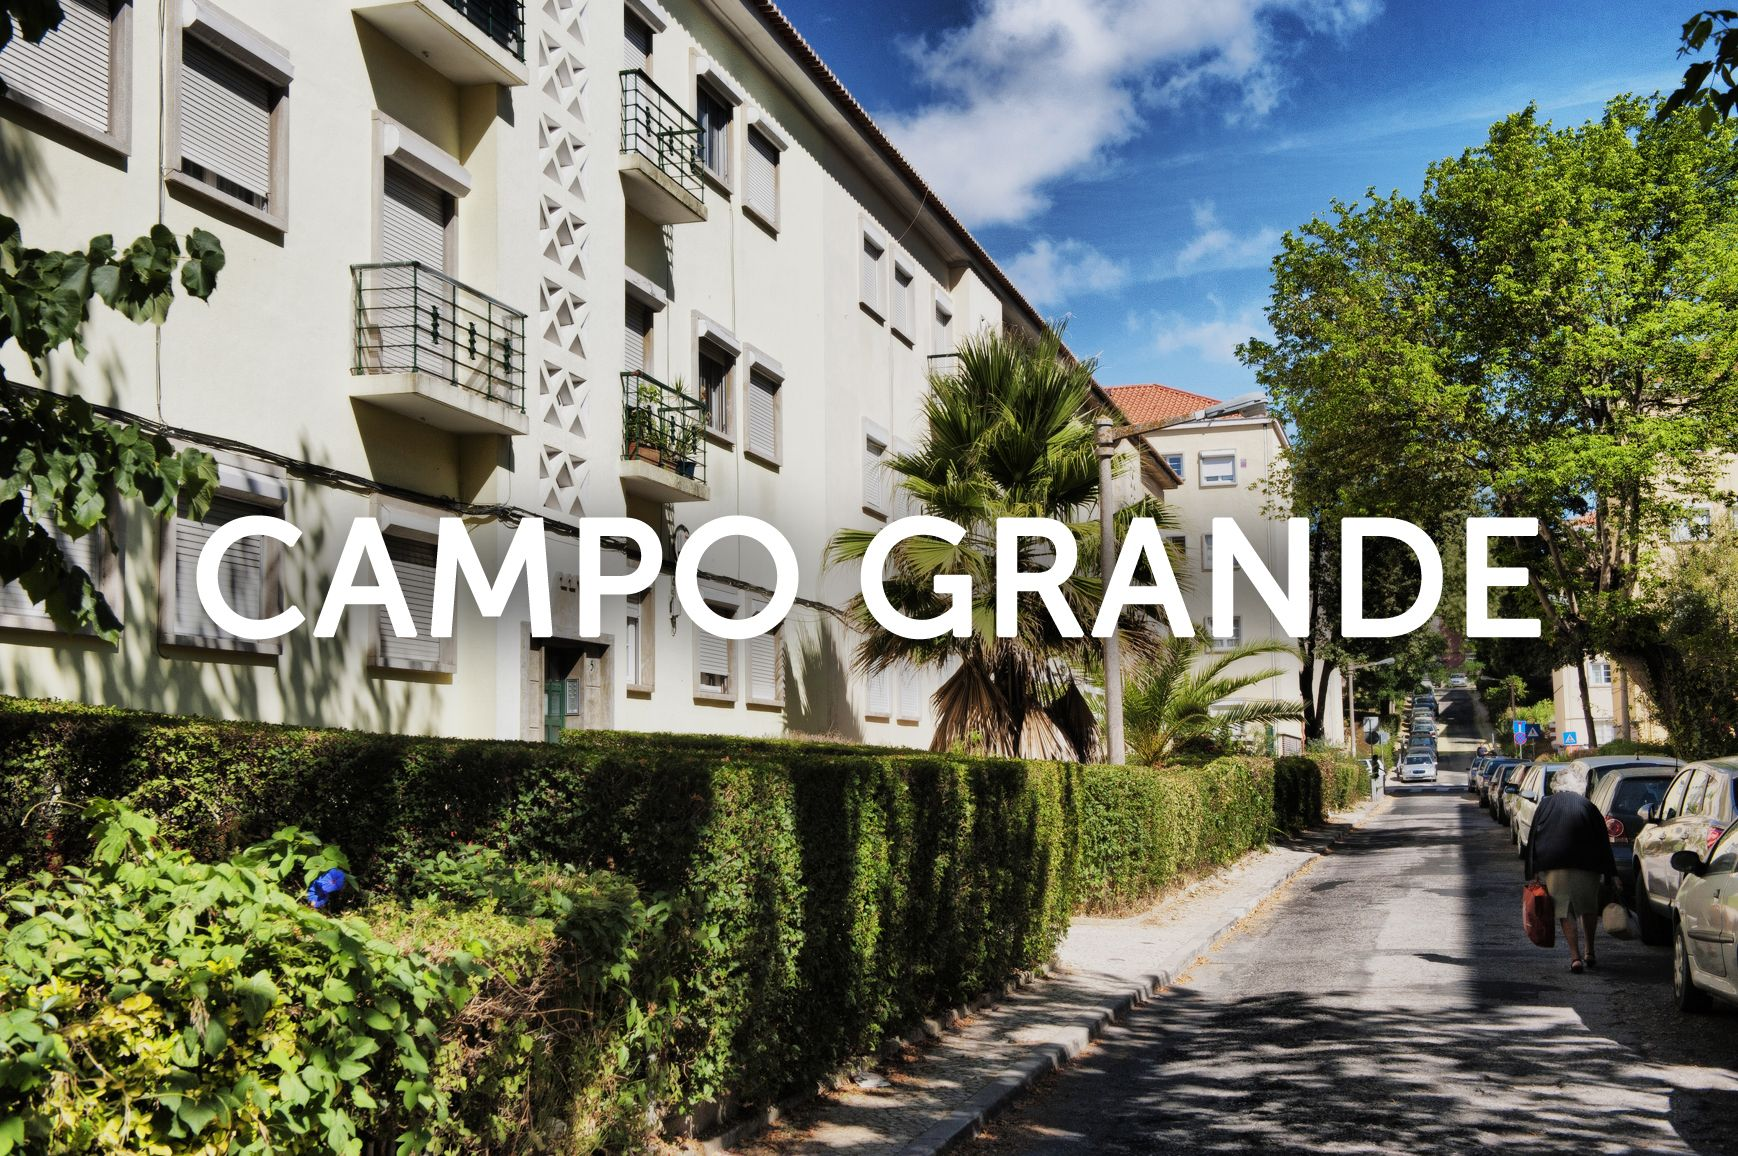 Home Hunting Lisboa - Campo Grande #HomeHunting #CampoGrande